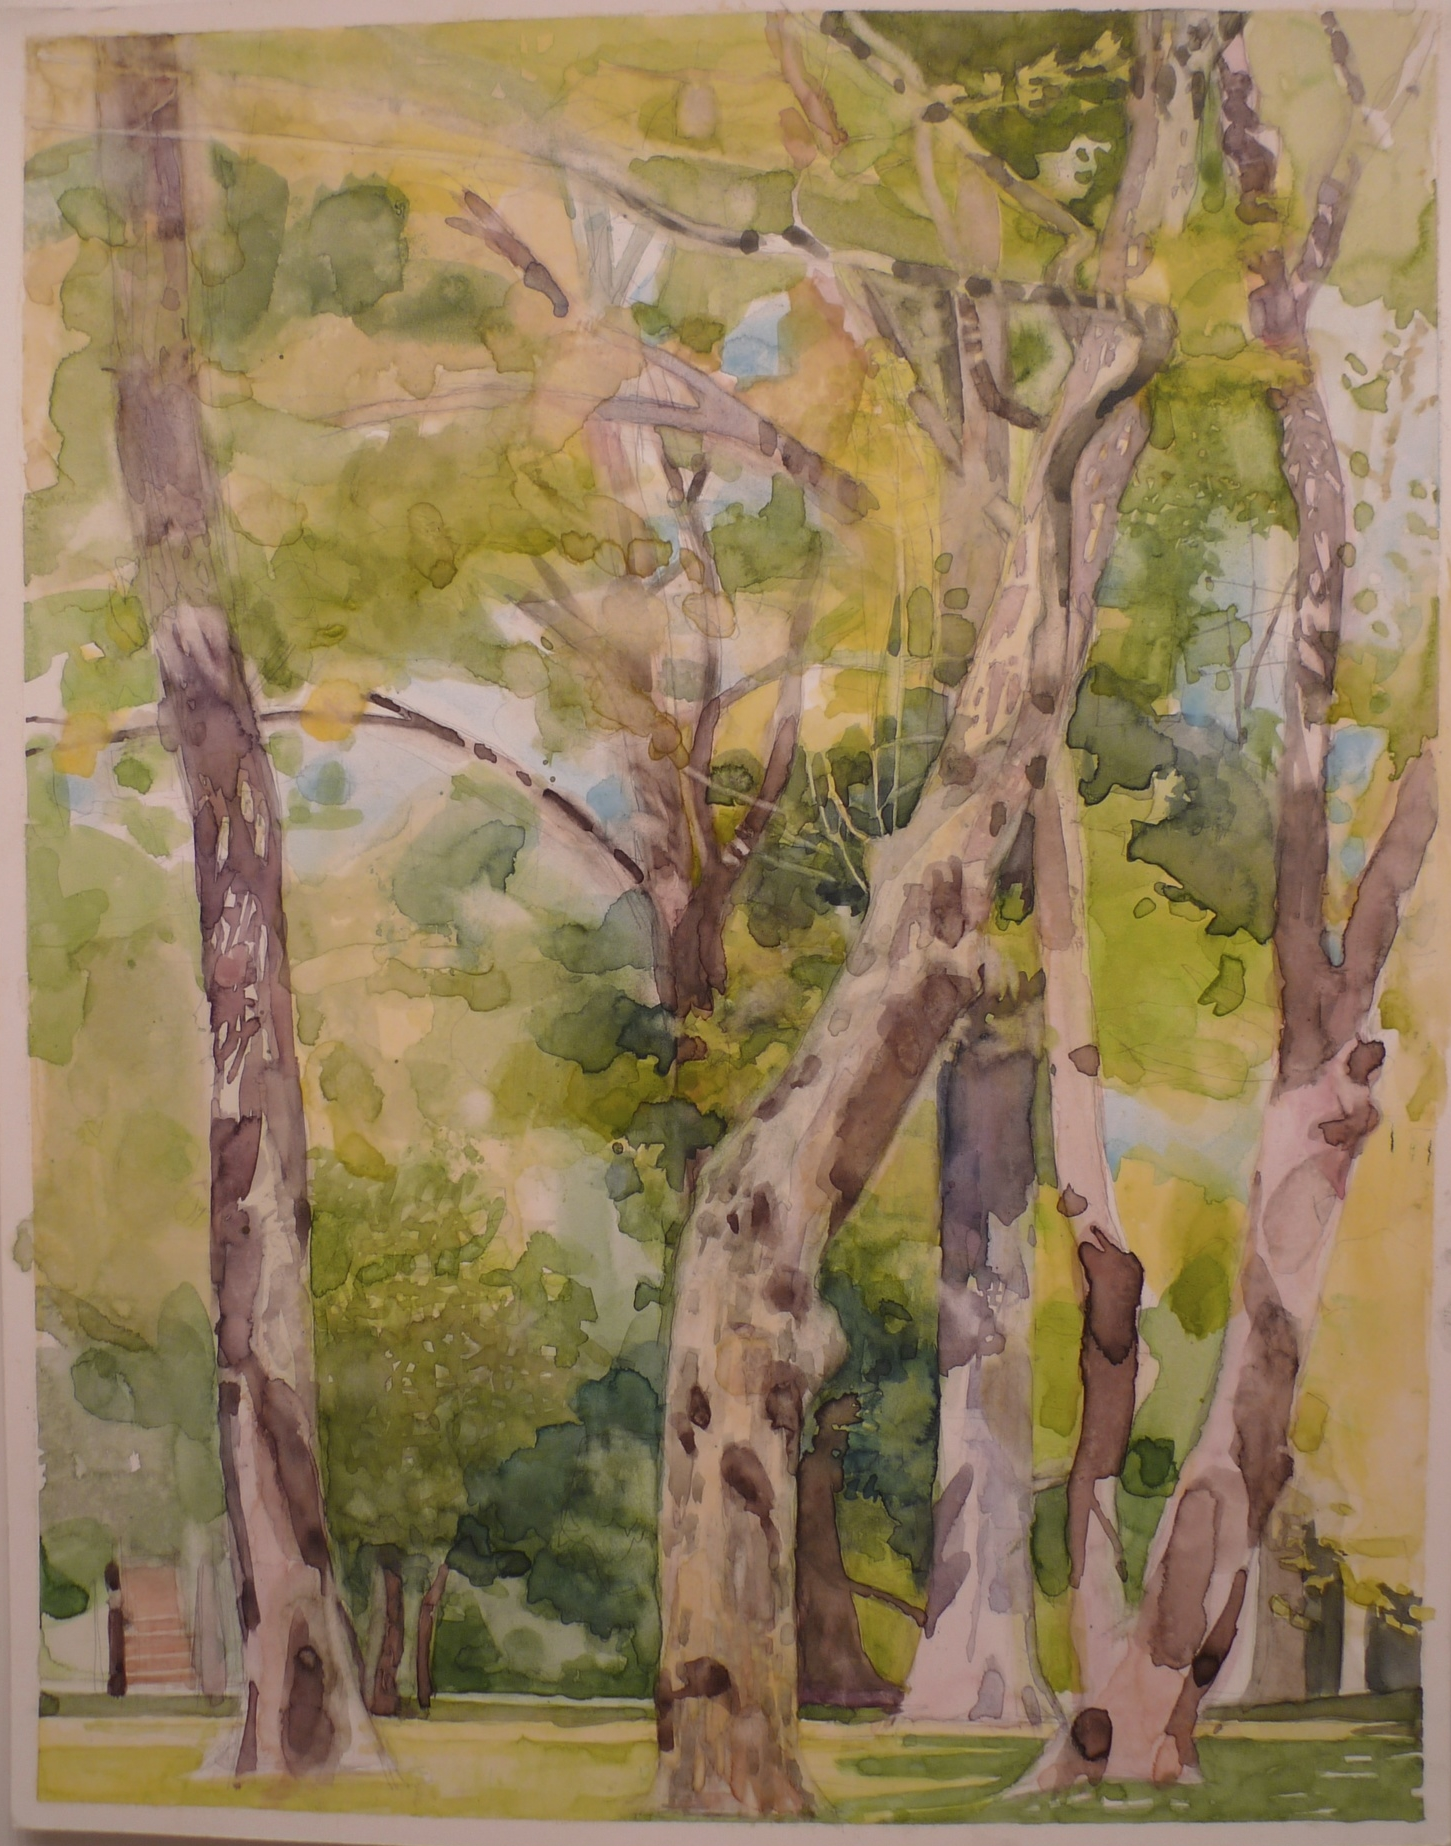 Watercolor on Paper 11 x 14 inches Tarek Ashkar,2008